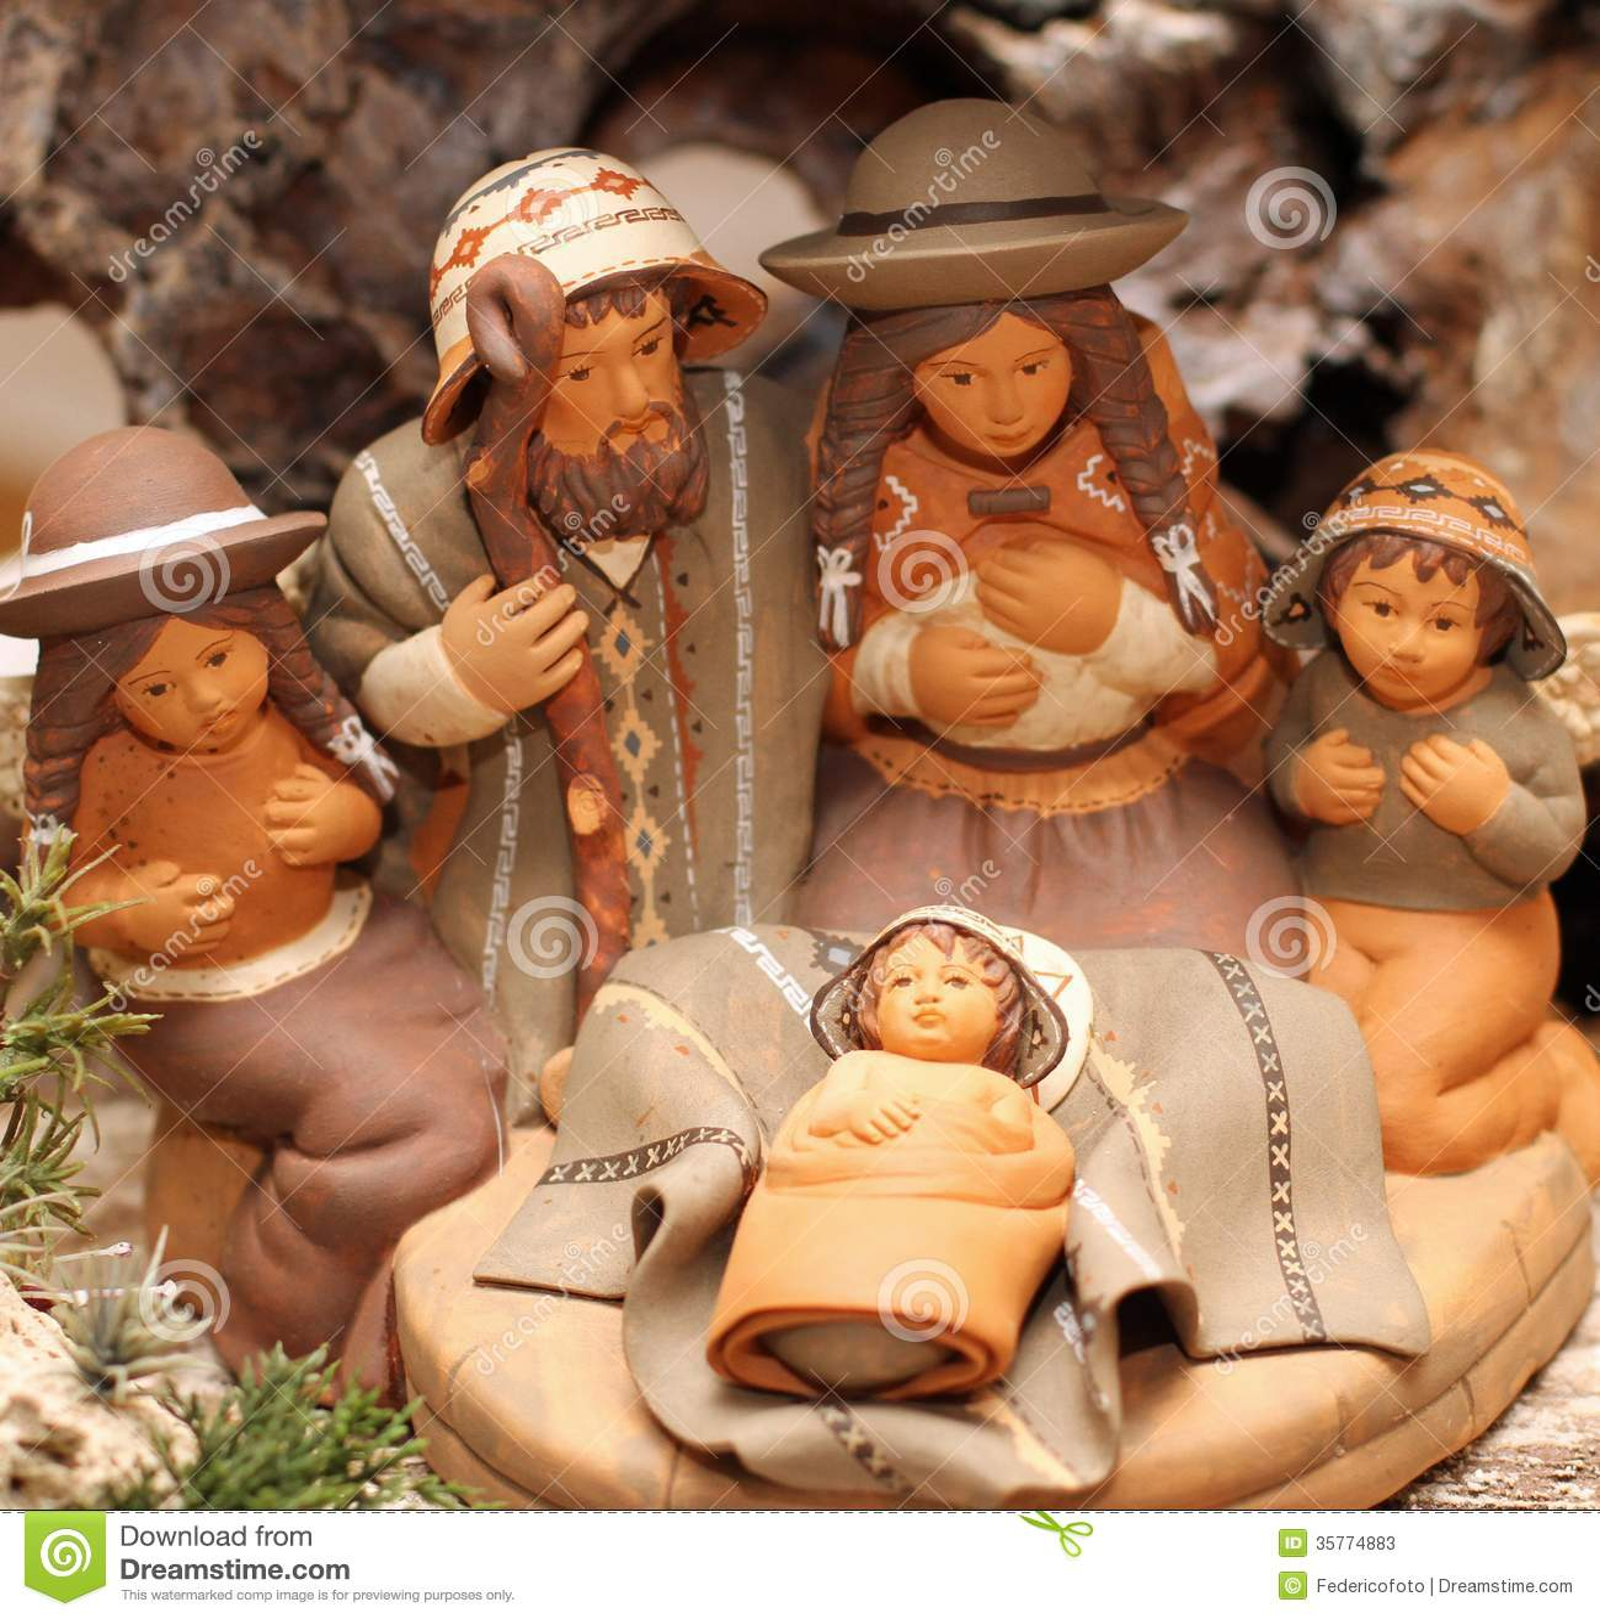 Family Of 4 Christmas Ornament